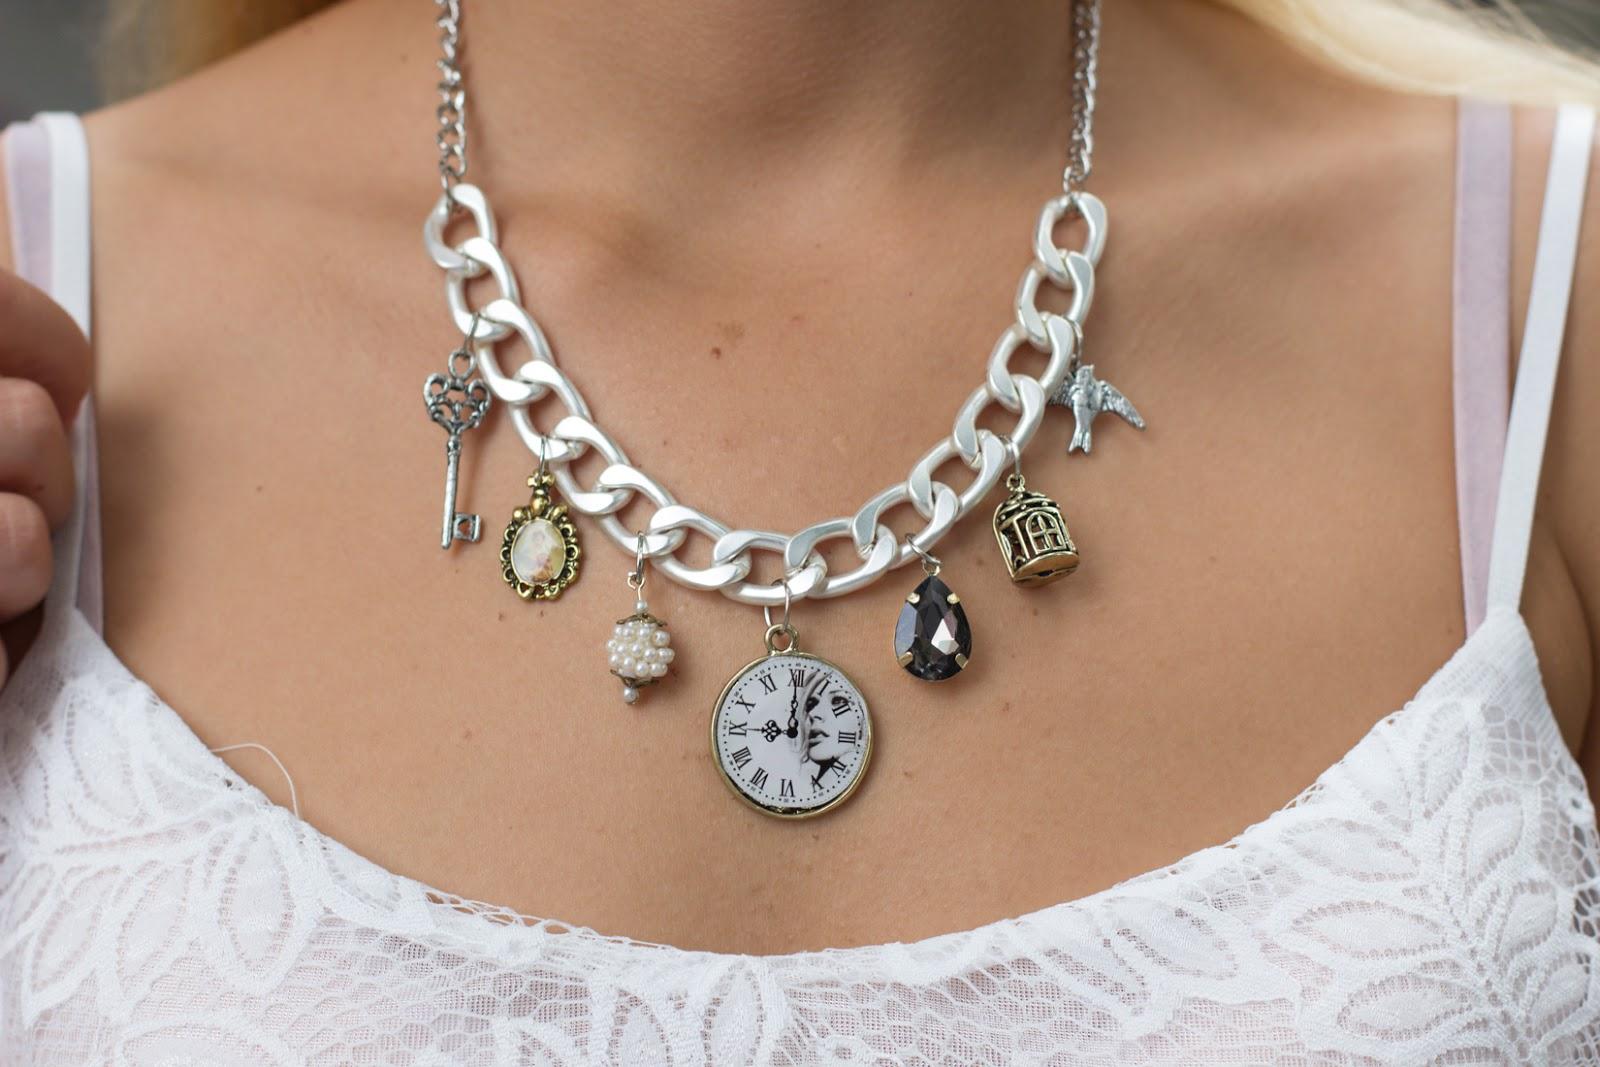 p.s. fashion necklace